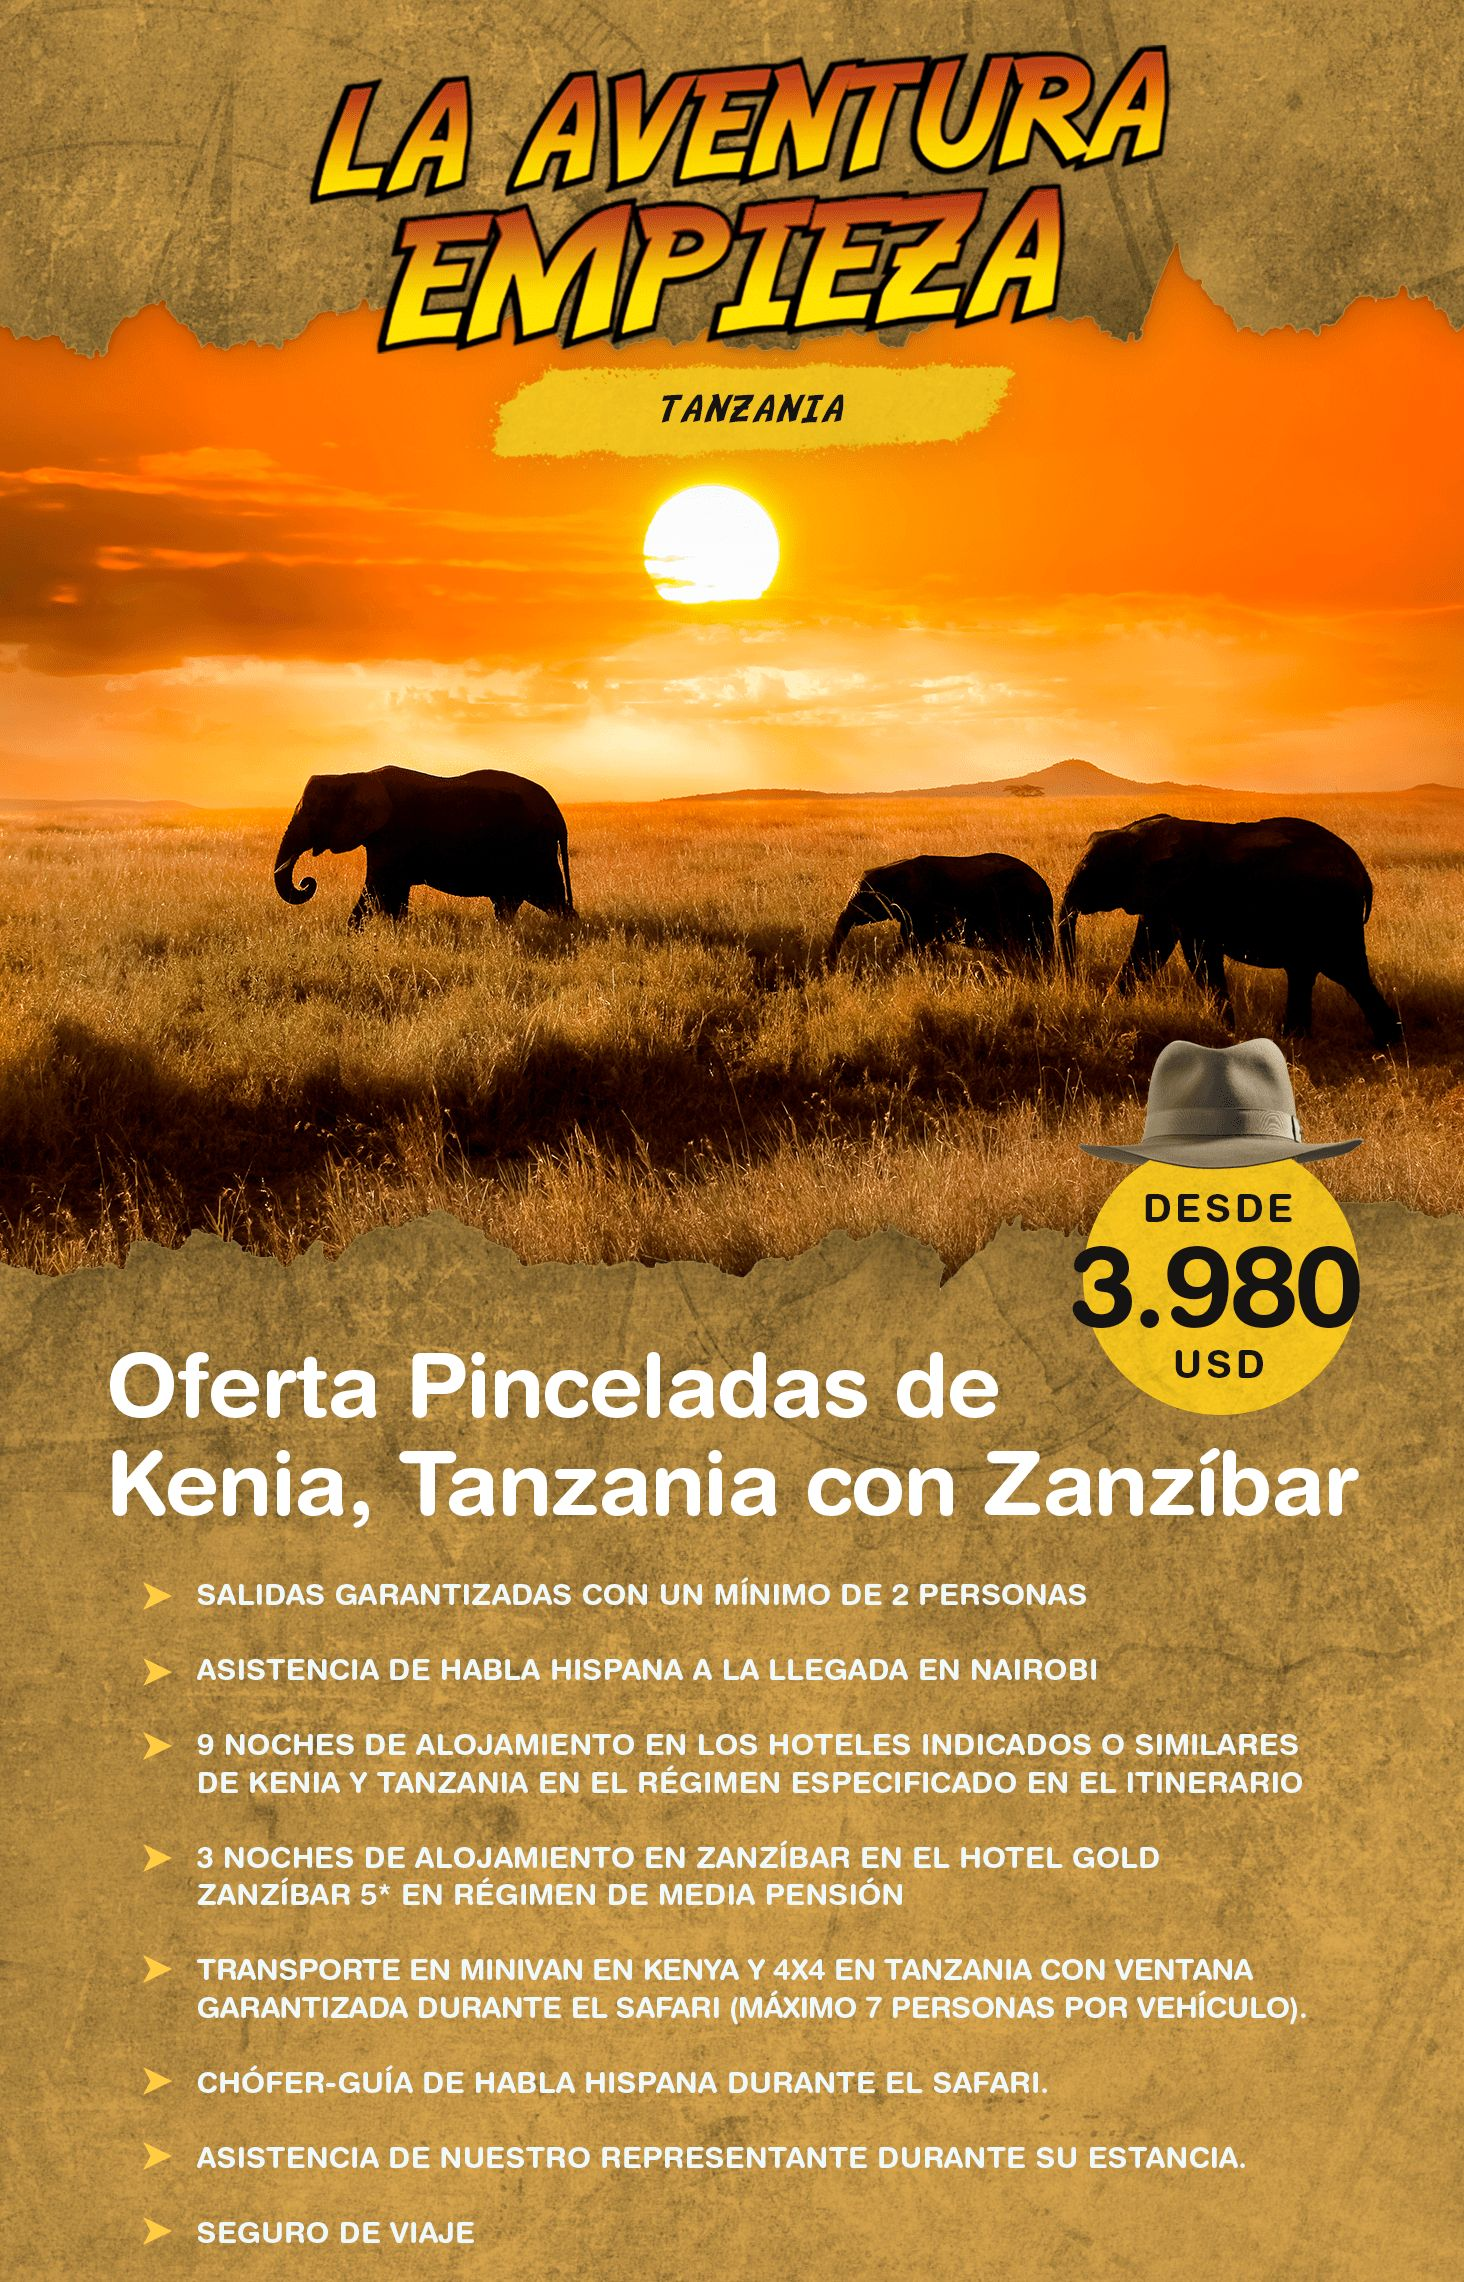 Oferta Kenia Tanzania y Zanzibar